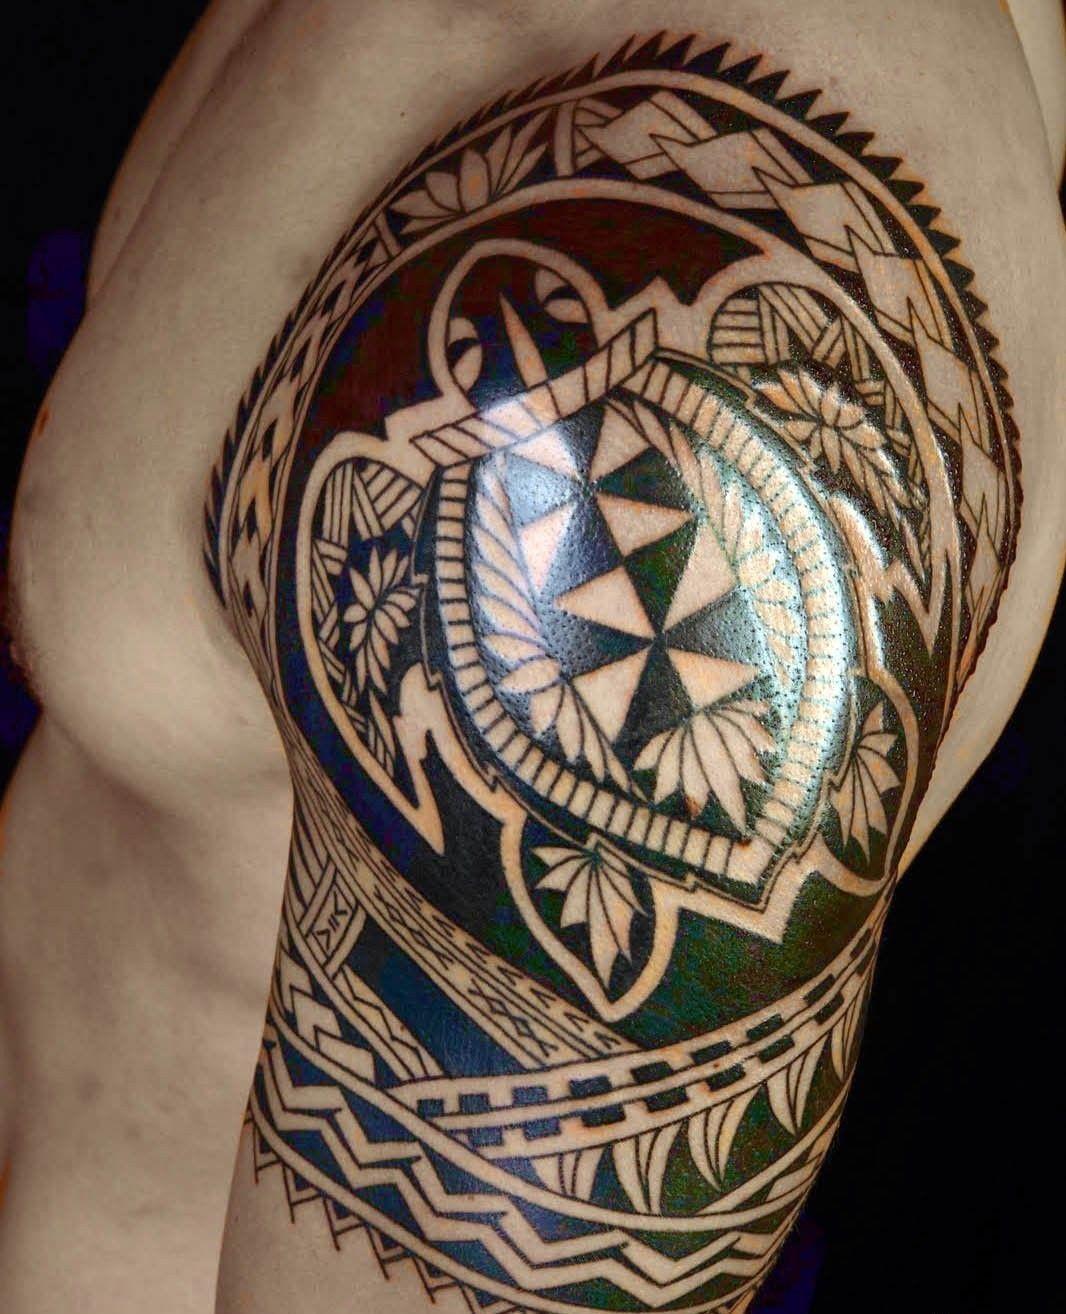 schildkröte als männer tattoo #tattoossamoandesigns | Samoan ... - Männer Tattoo Arm